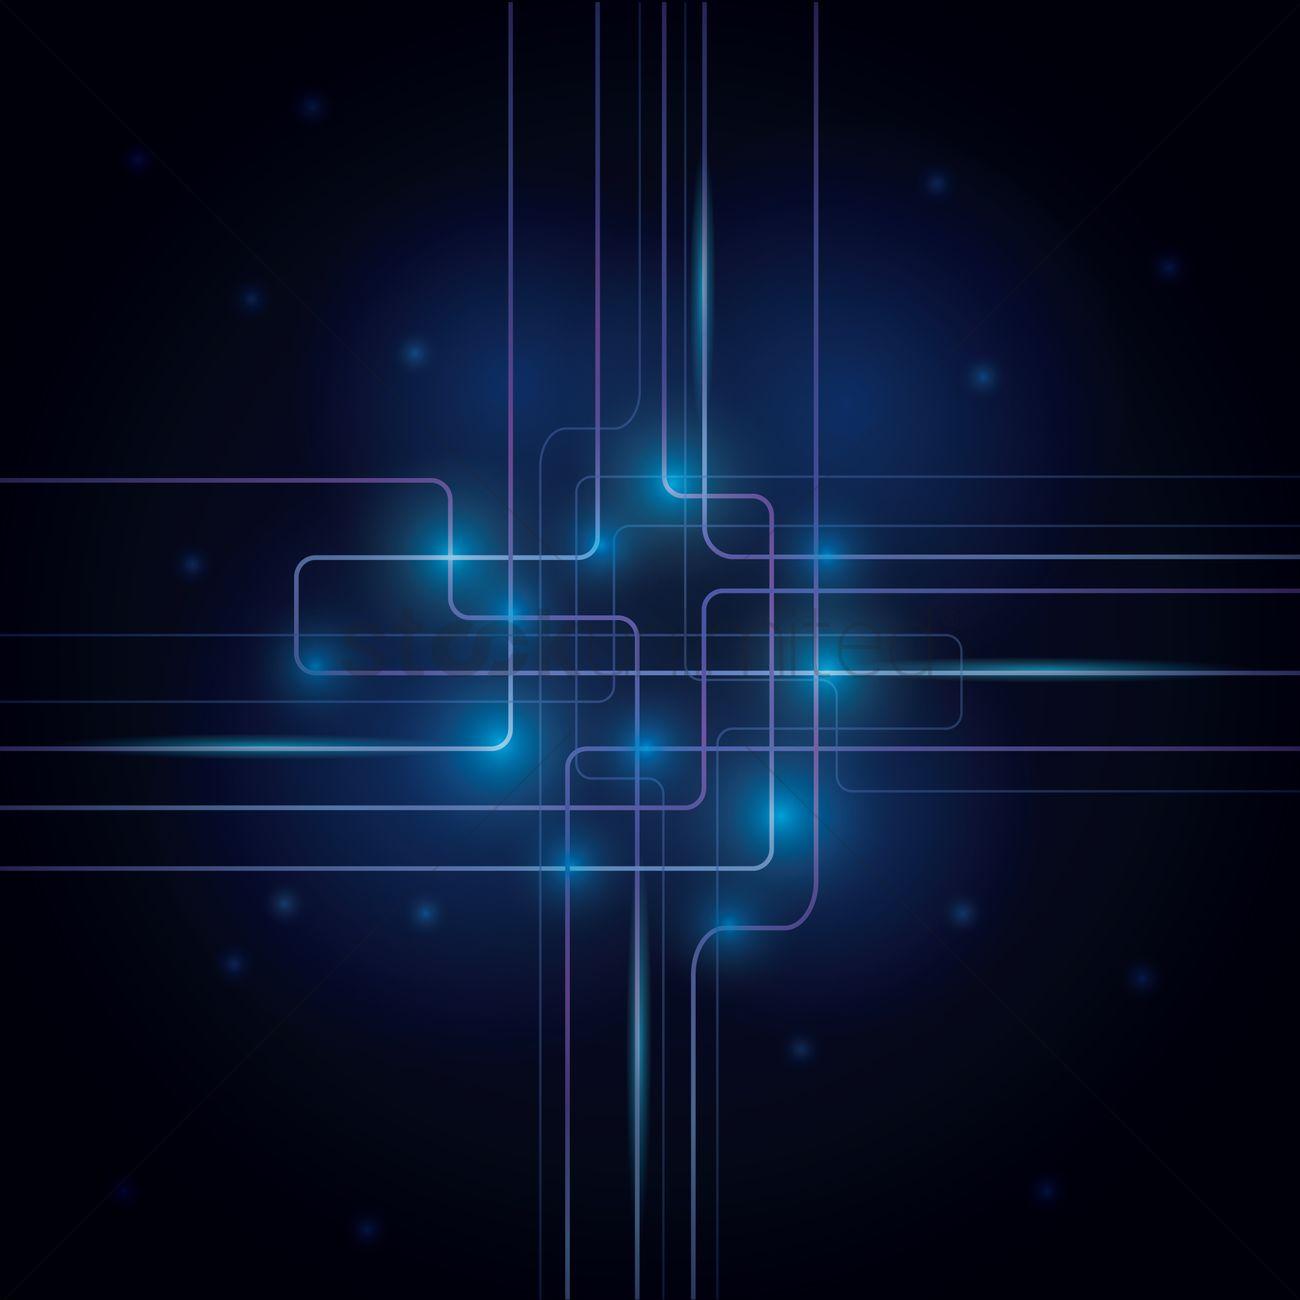 Abstract Circuit Board Design Vector Image 1648214